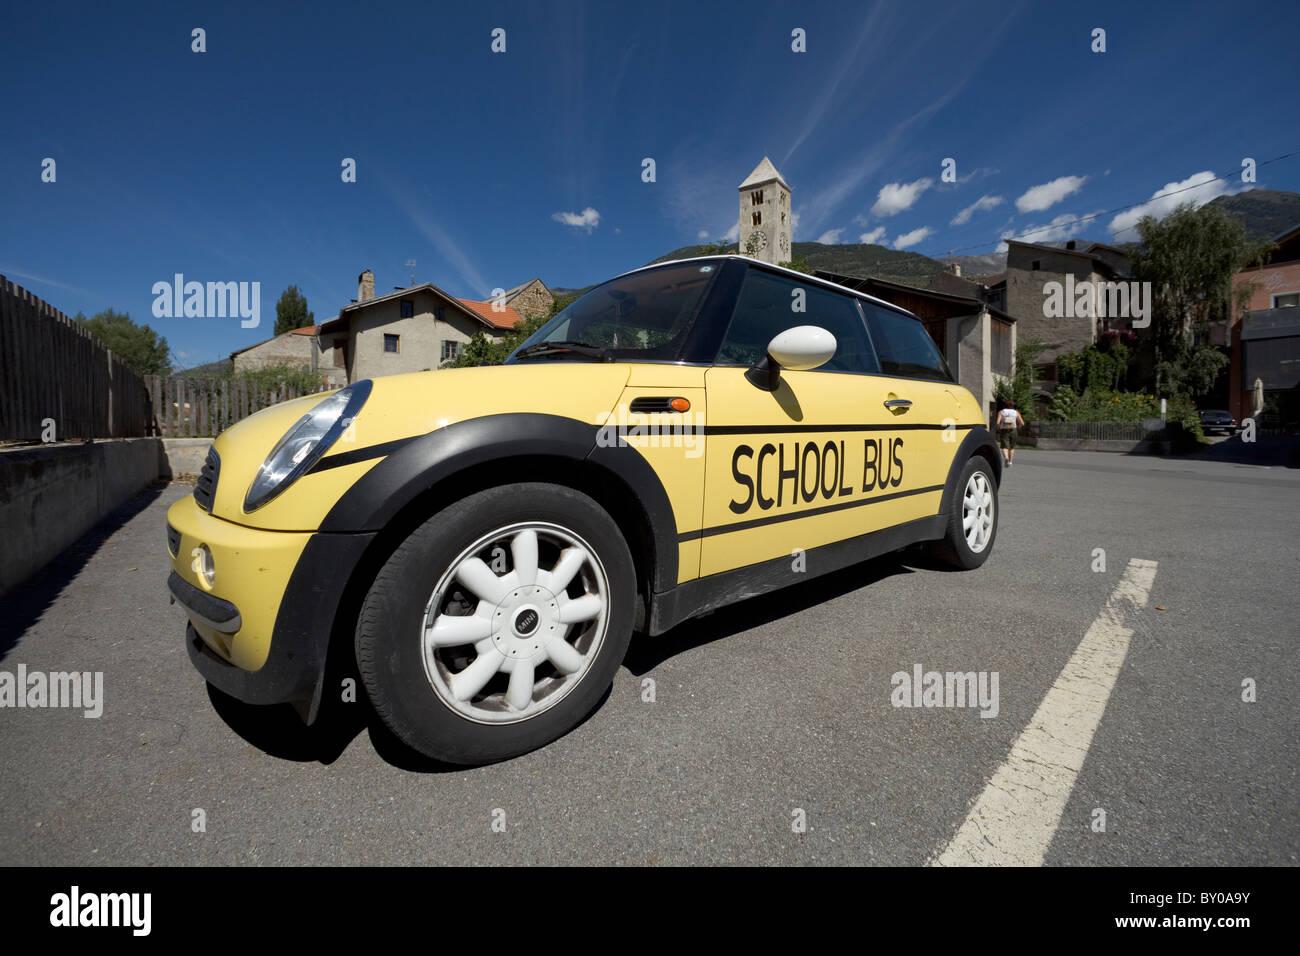 Mini car used as a 'School bus', Val Venosta/Vinschgau, Alto Adige/South Tyrol, Italy - Stock Image